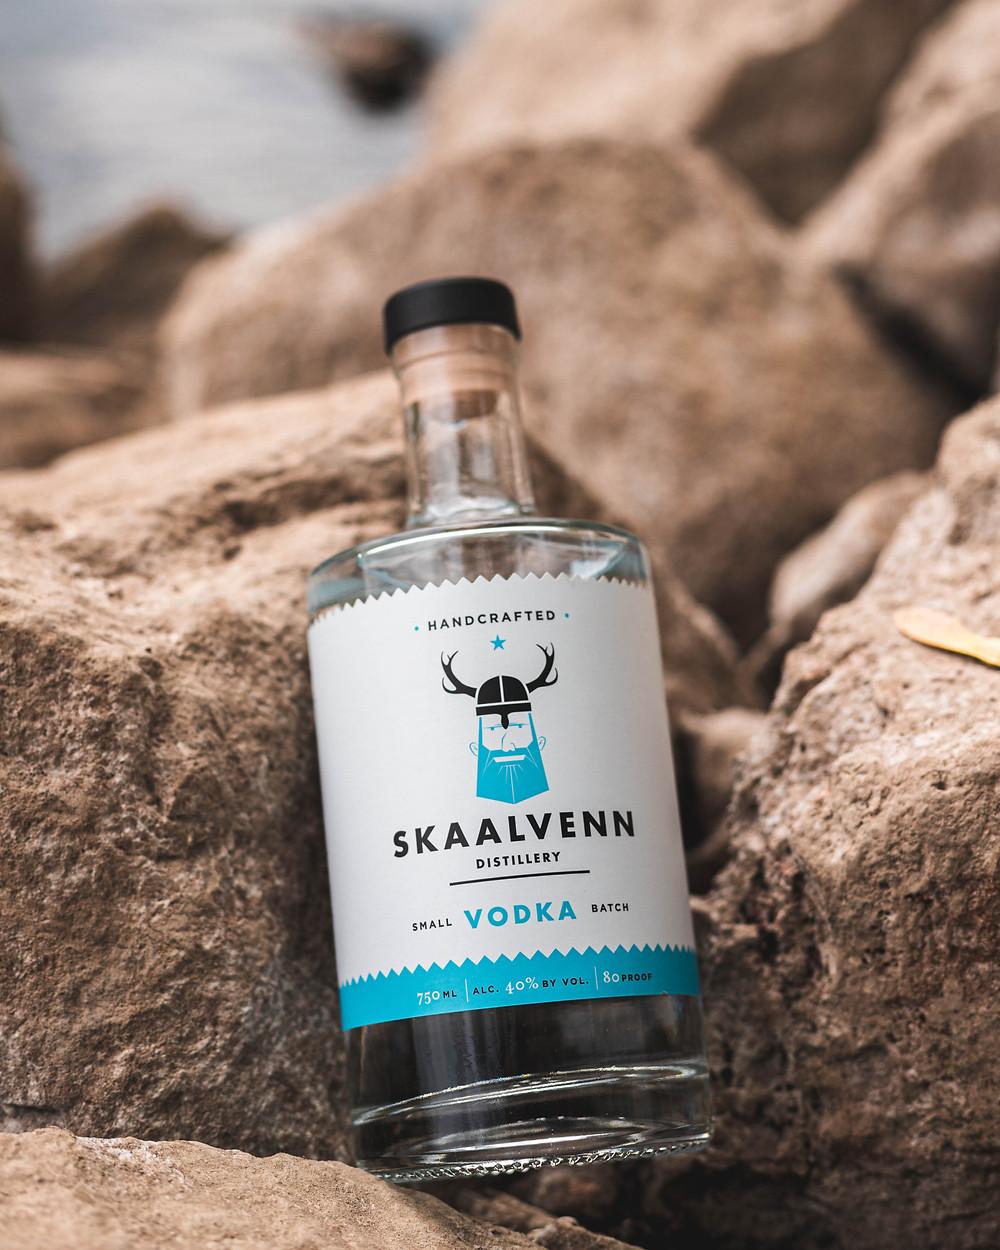 Skaalvenn Vodka sitting on some rocks by the river